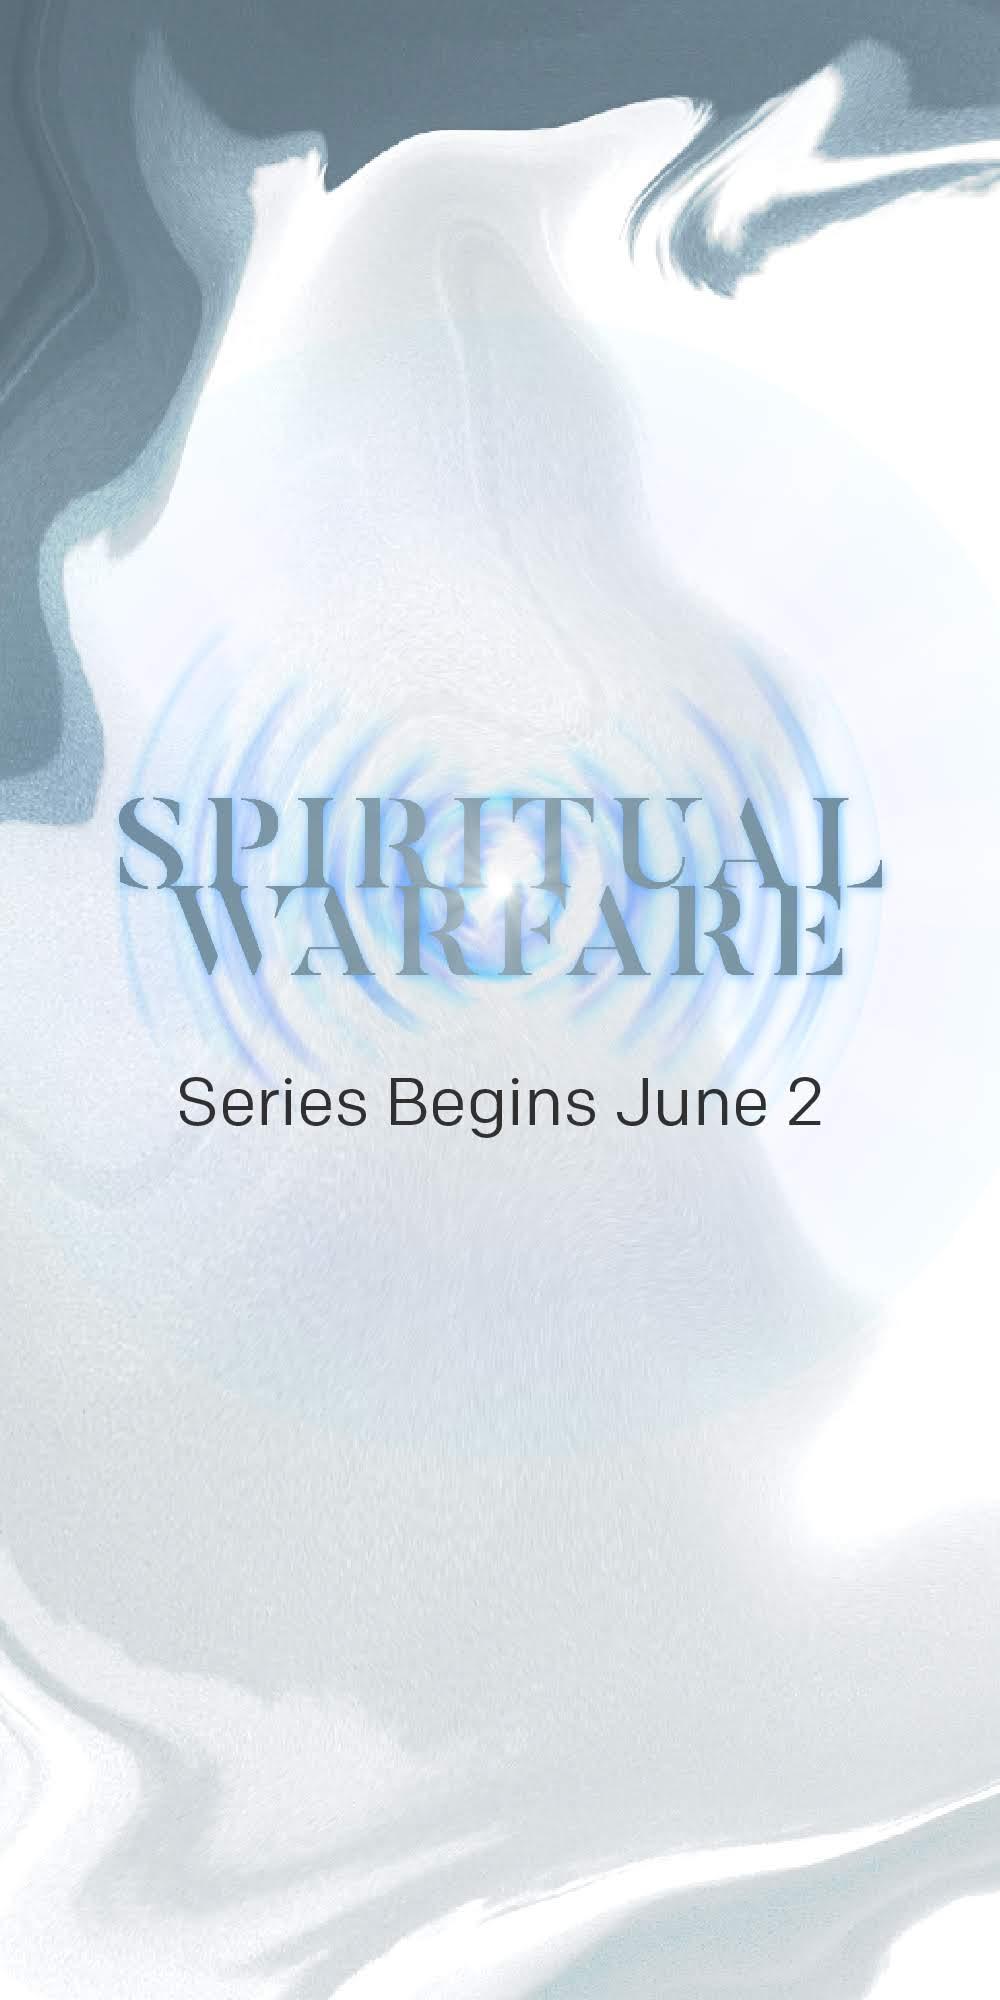 spiritual.warfaresocial1-100.jpg